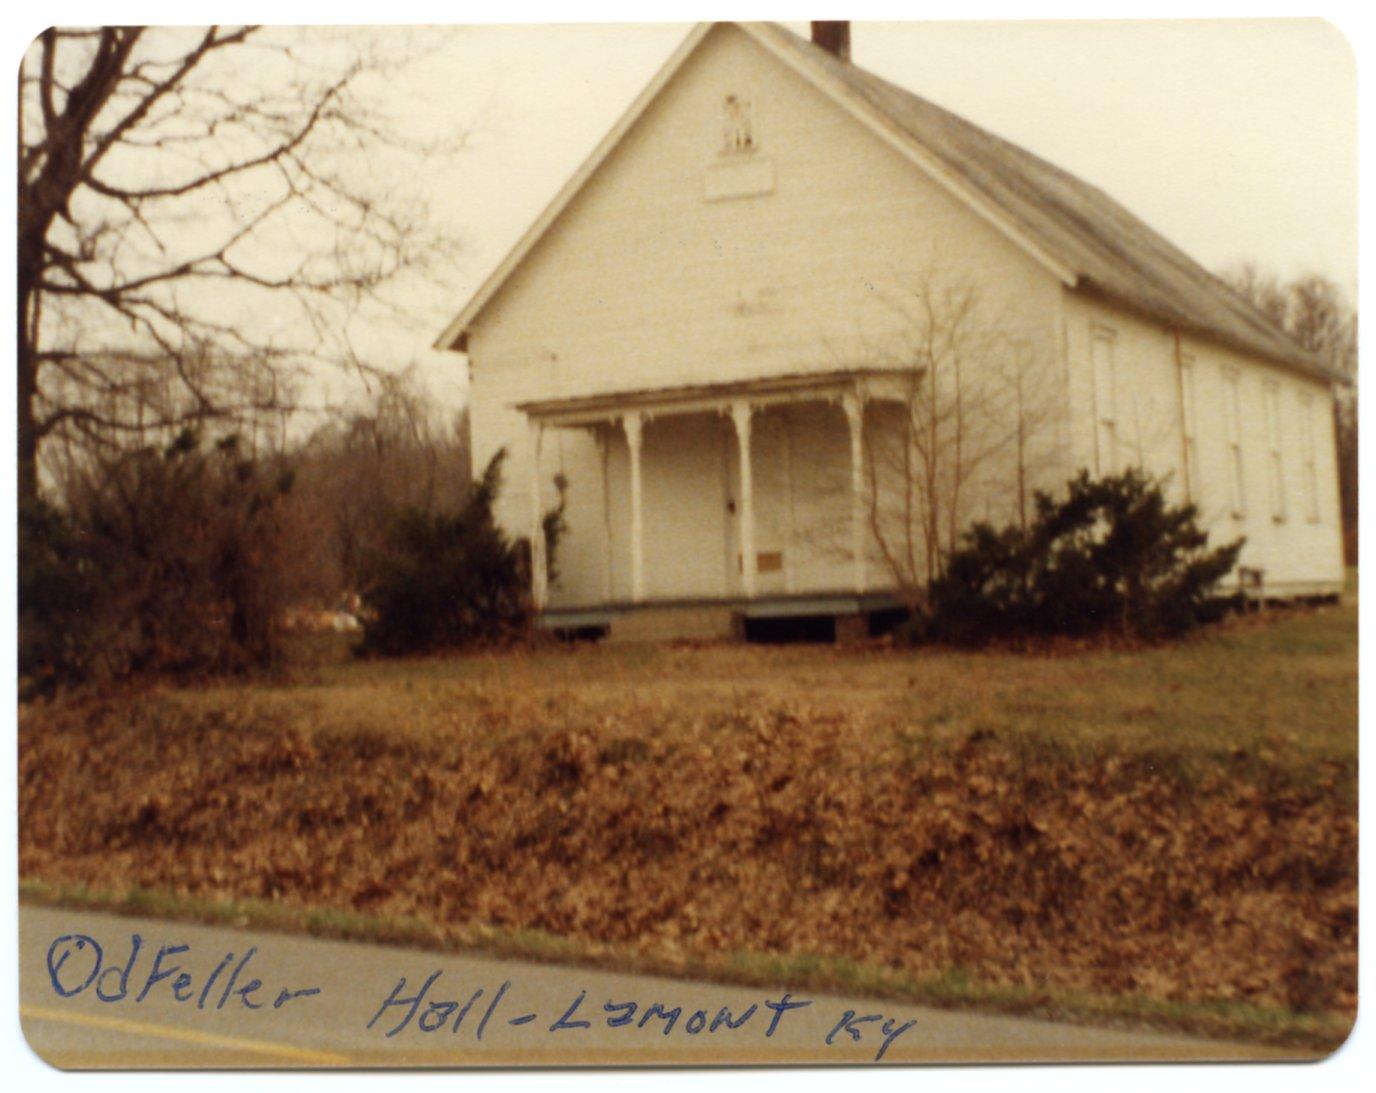 Oddfellow Hall at Lamont, KY